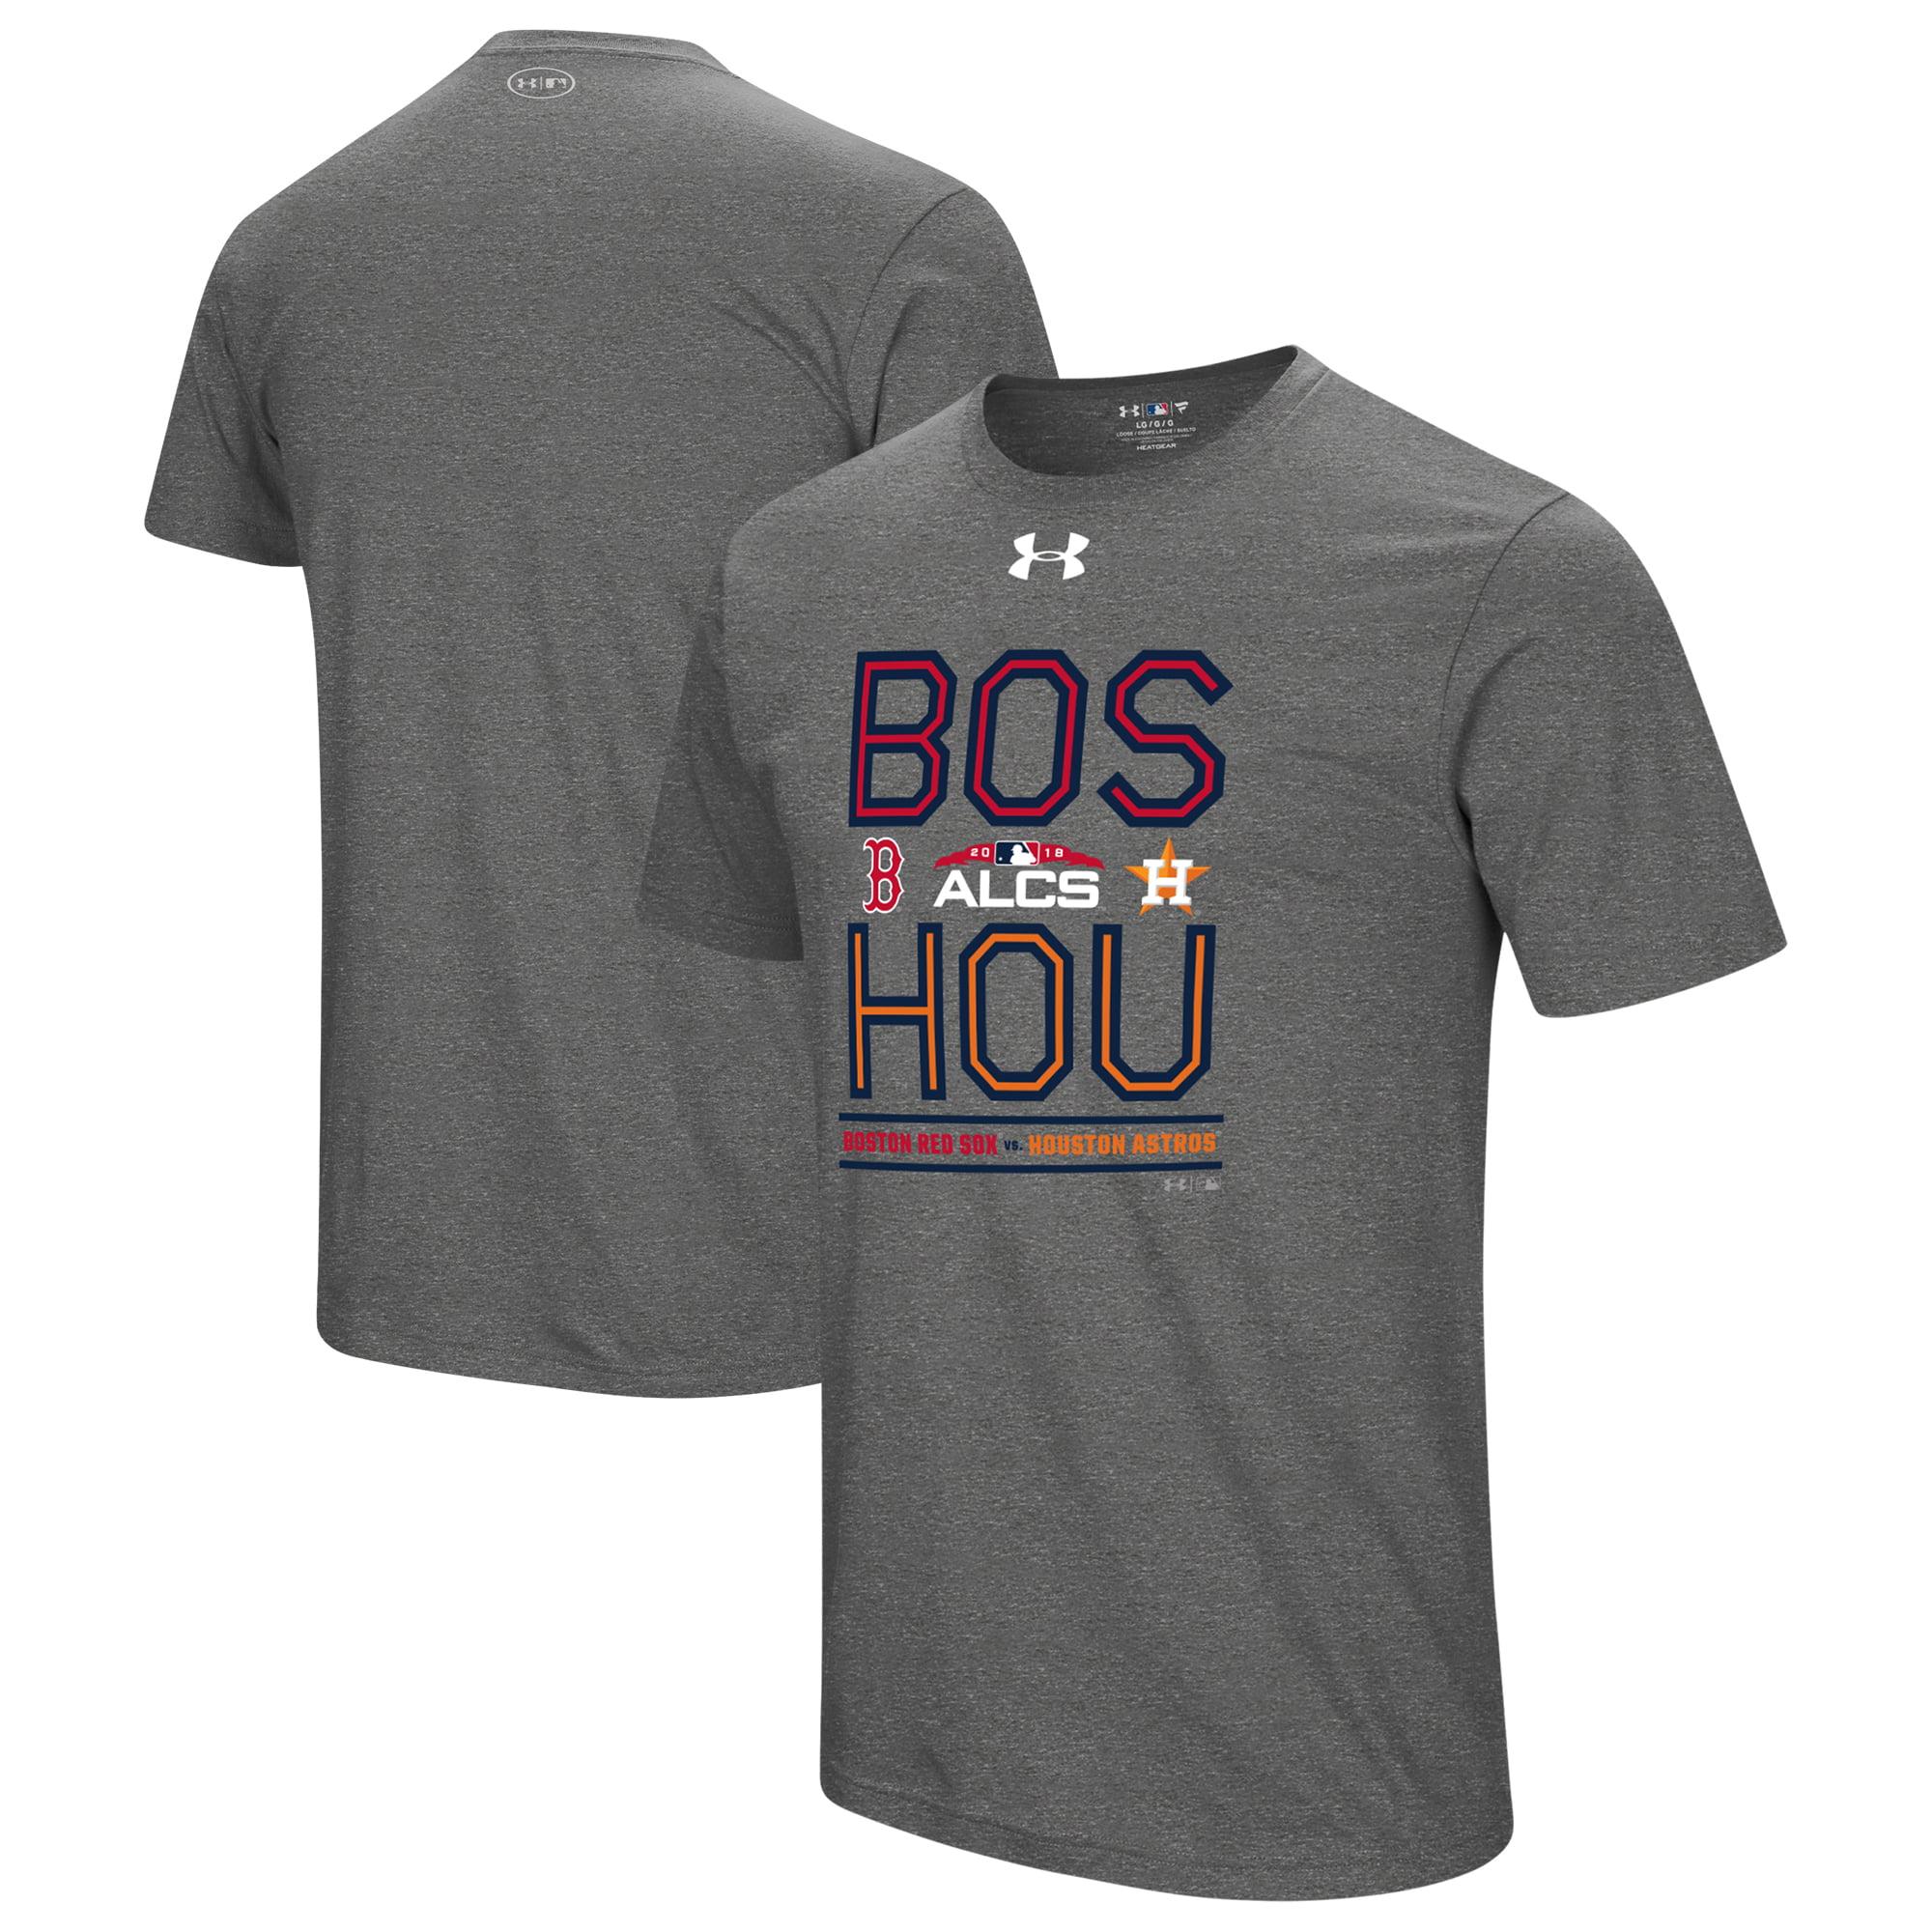 Boston Red Sox vs. Houston Astros Under Armour 2018 ALCS Matchup Big Block Performance T-Shirt - Gray